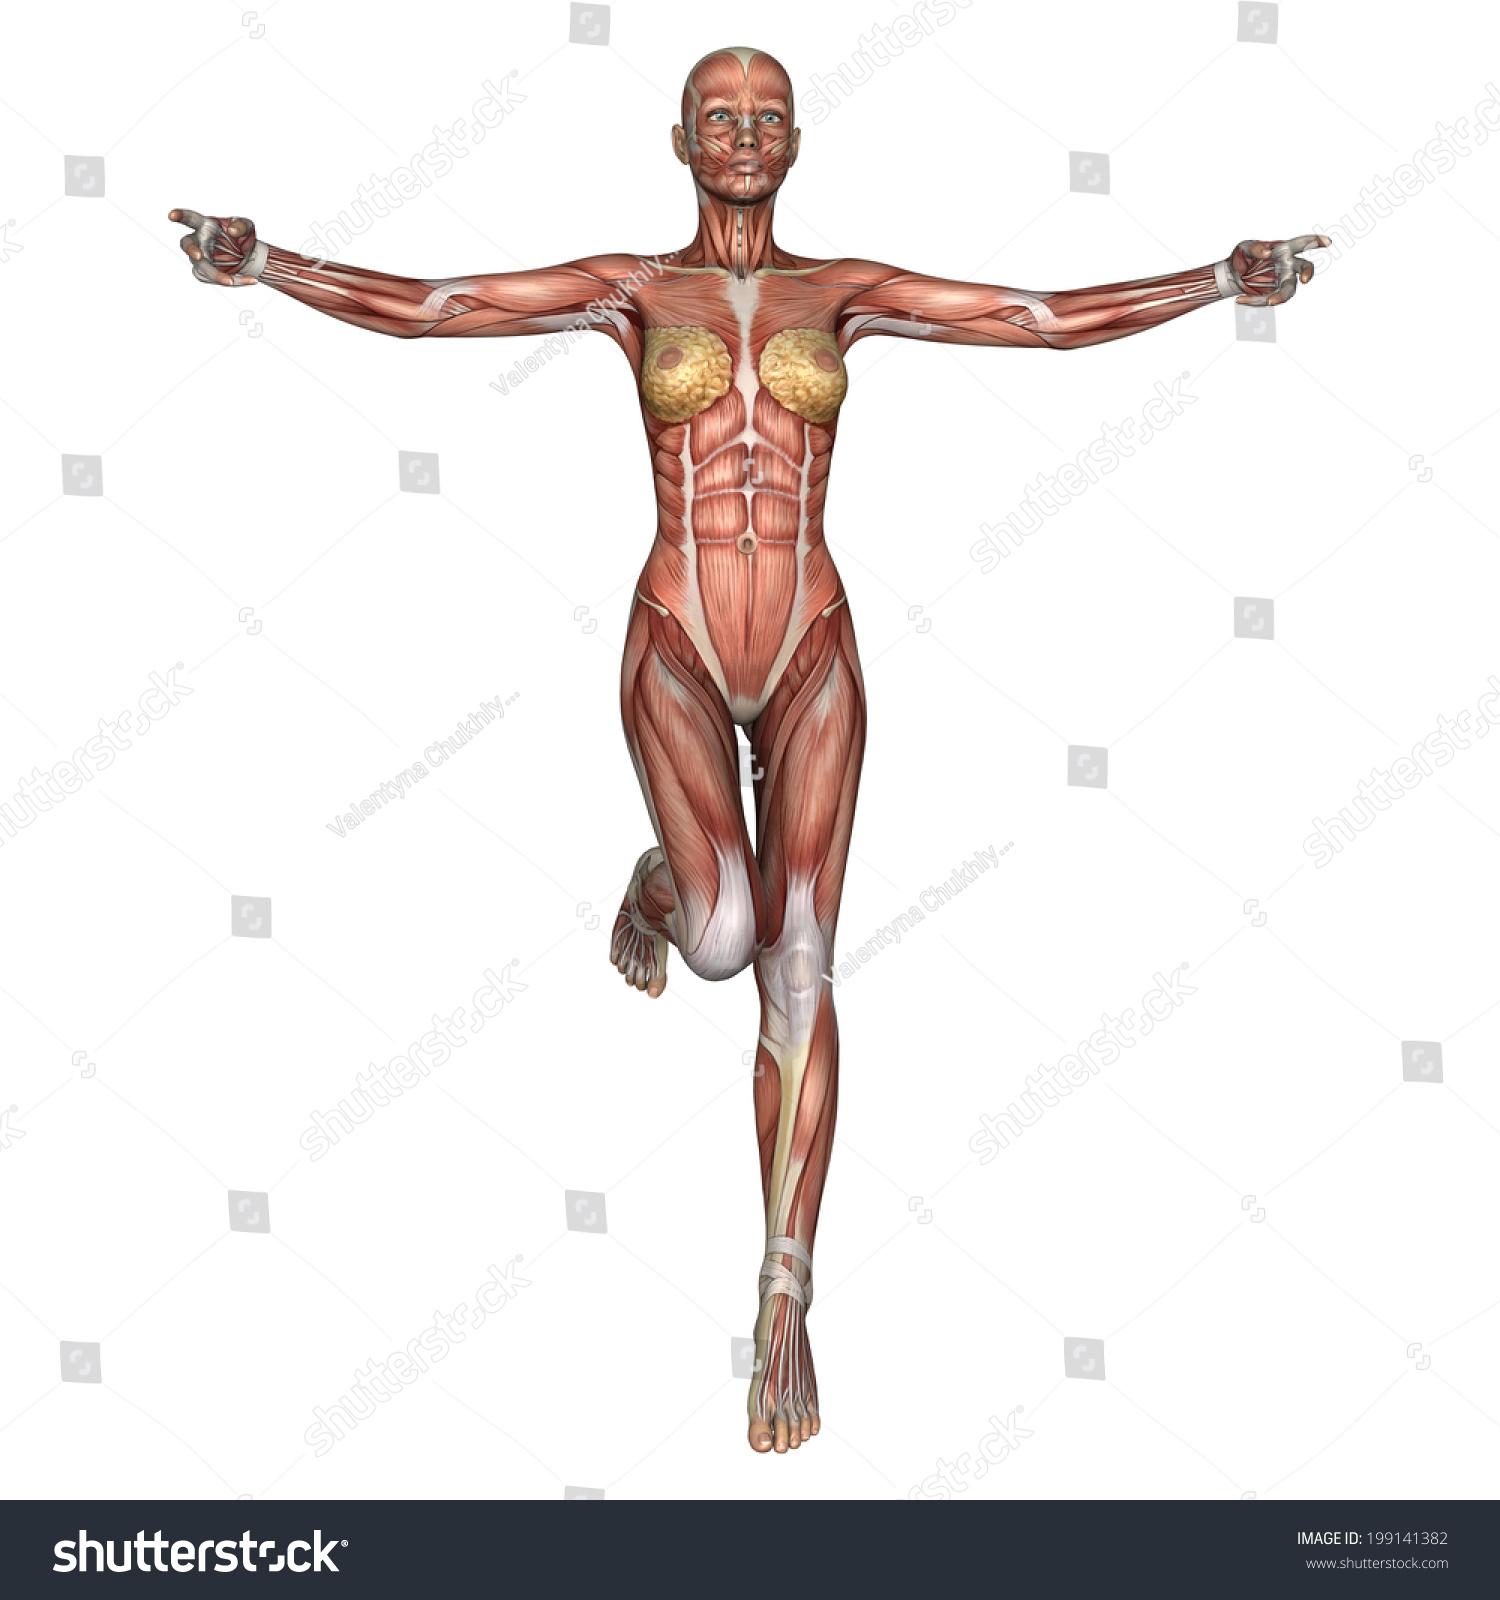 Royalty Free Stock Illustration Of 3 D Digital Render Exercising